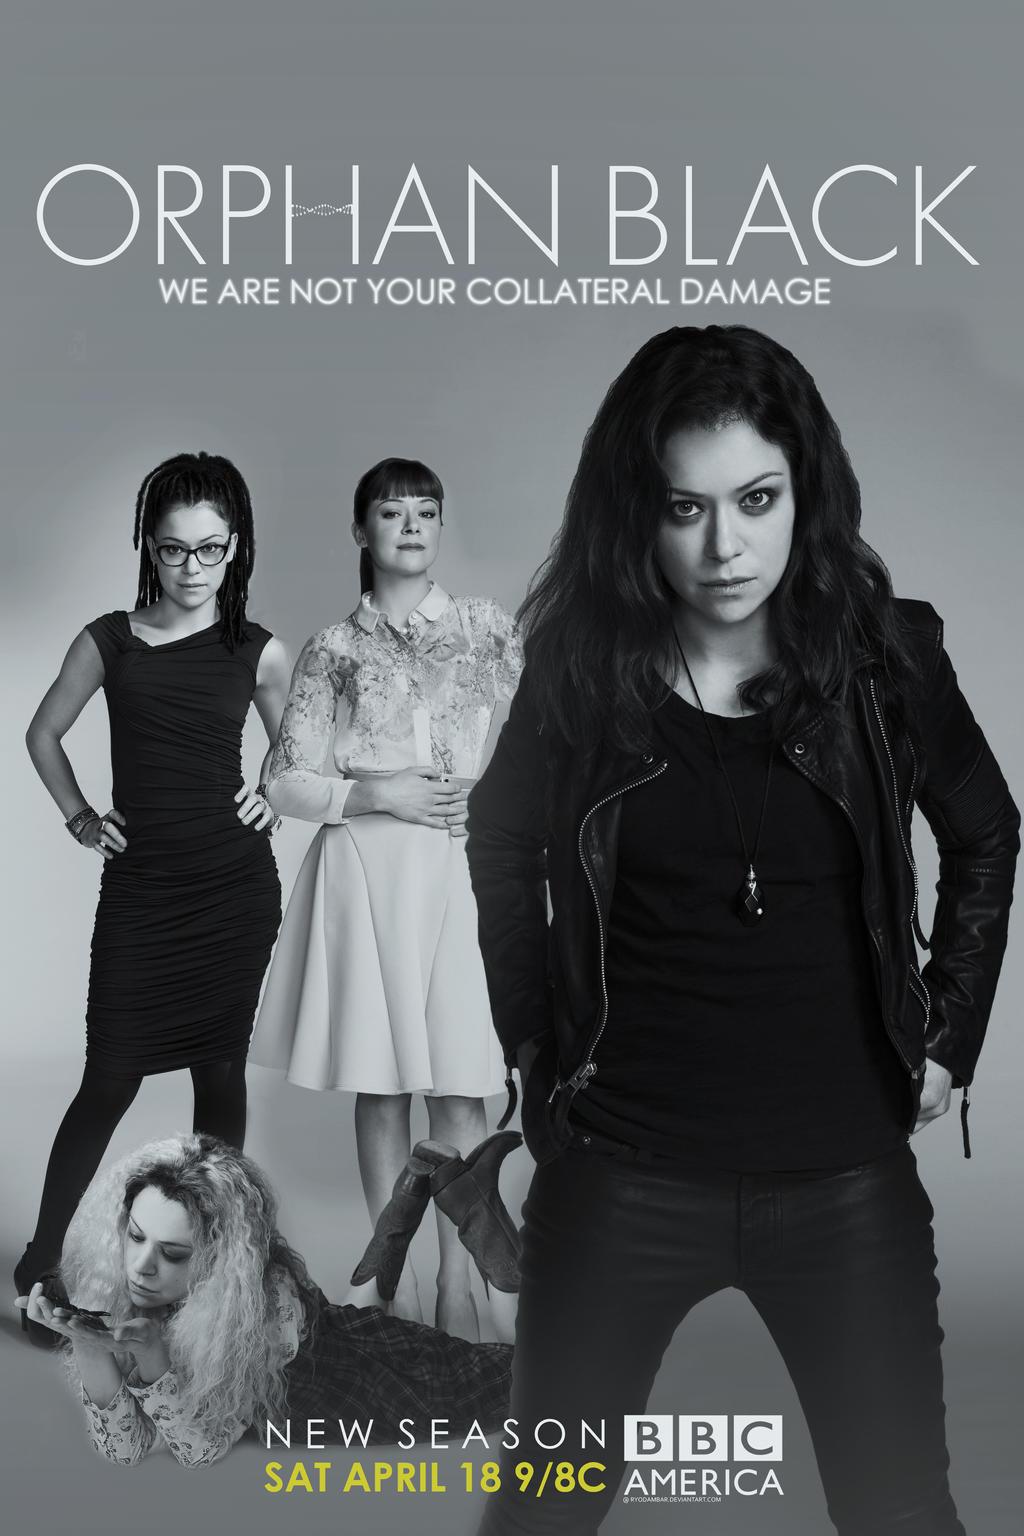 'Orphan Black' Season 3 Posters | BBC America |Orphan Black Season 3 Poster